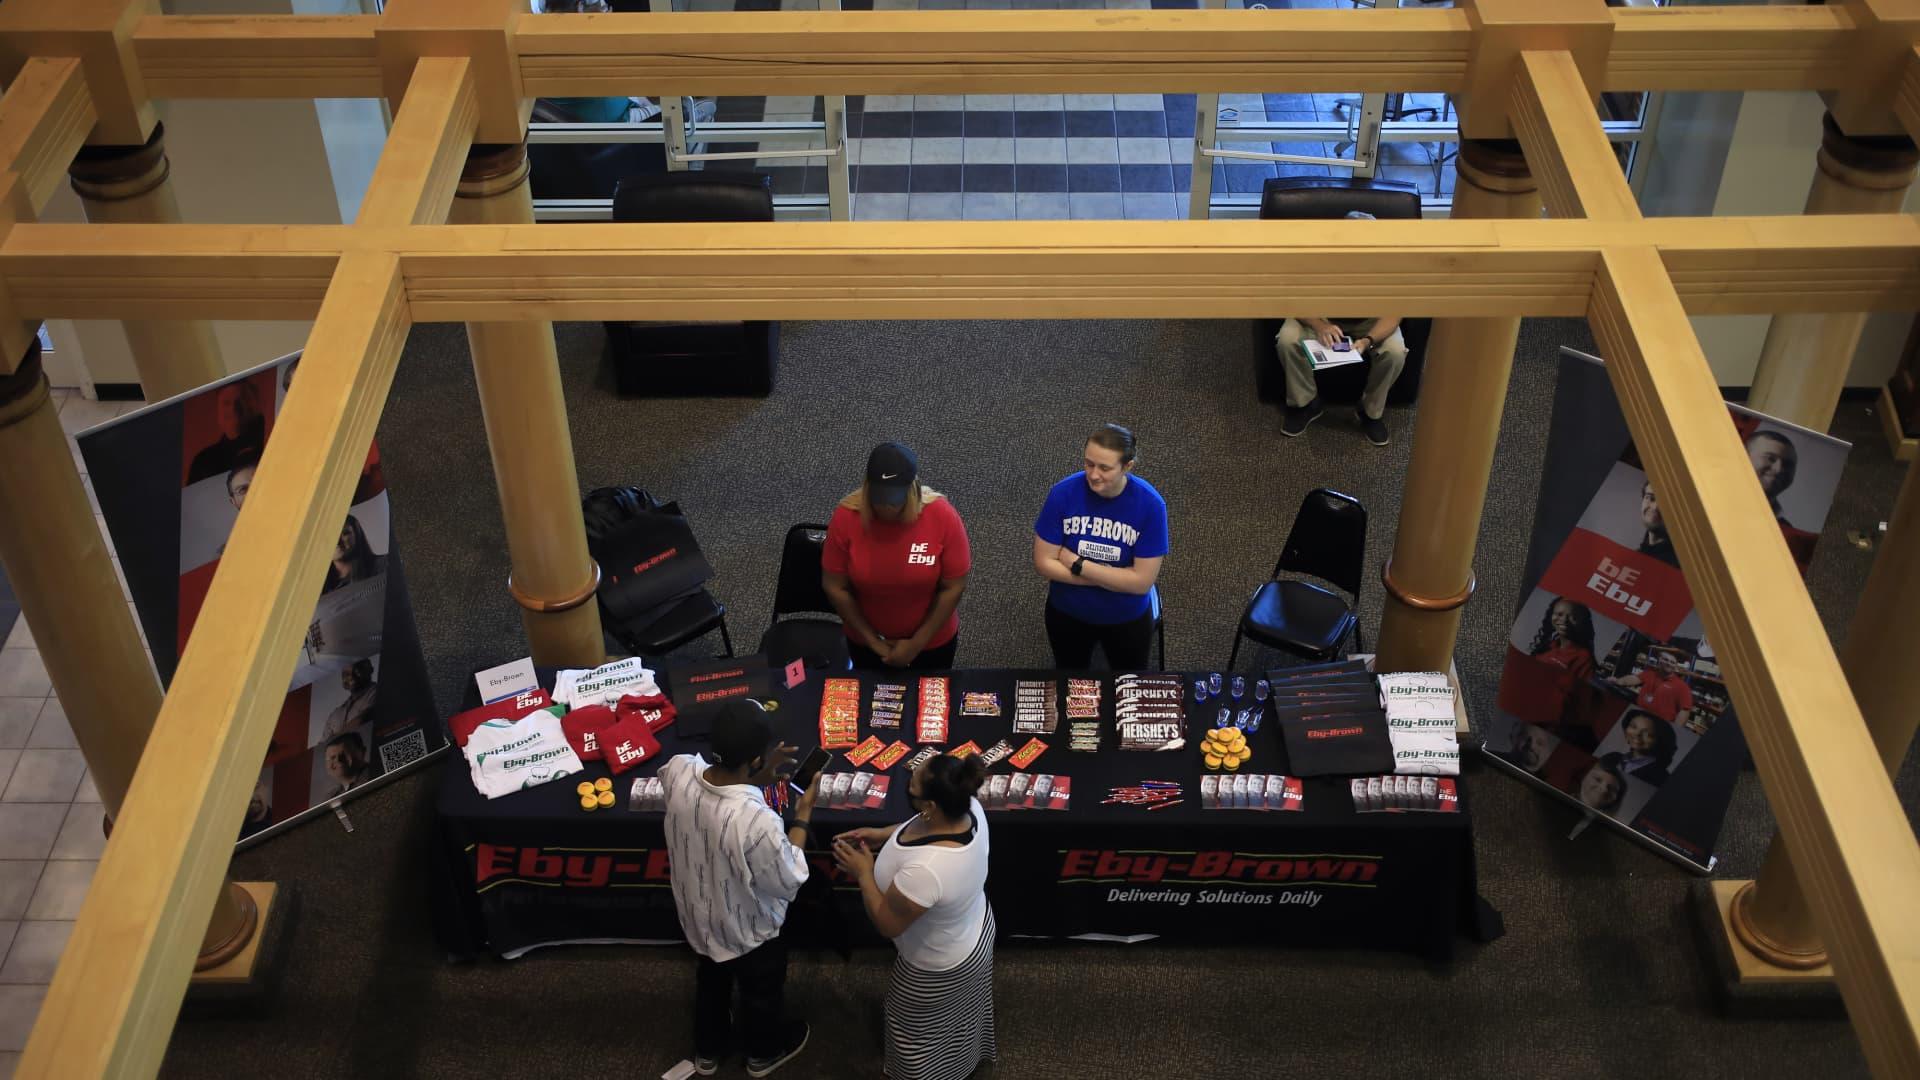 Job seekers speak with recruiters at a Job News USA career fair in Louisville, Kentucky, on June 23, 2021.